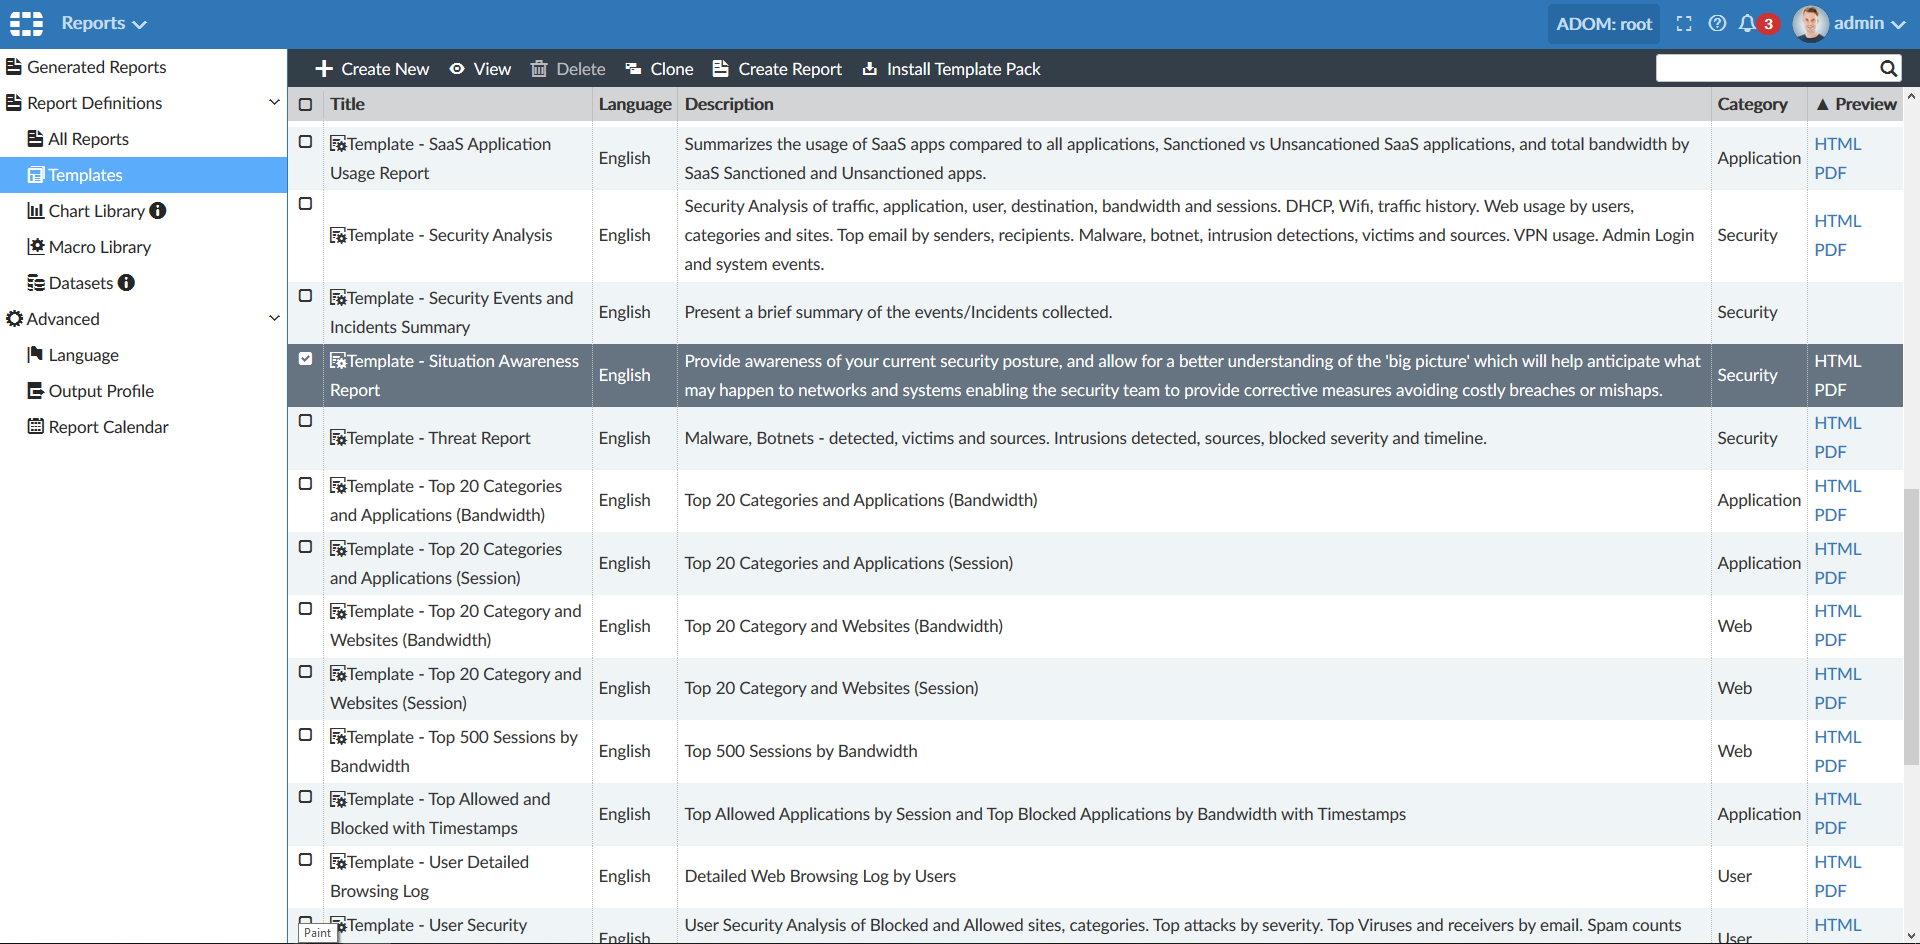 Screenshot of highlighted situation awareness report